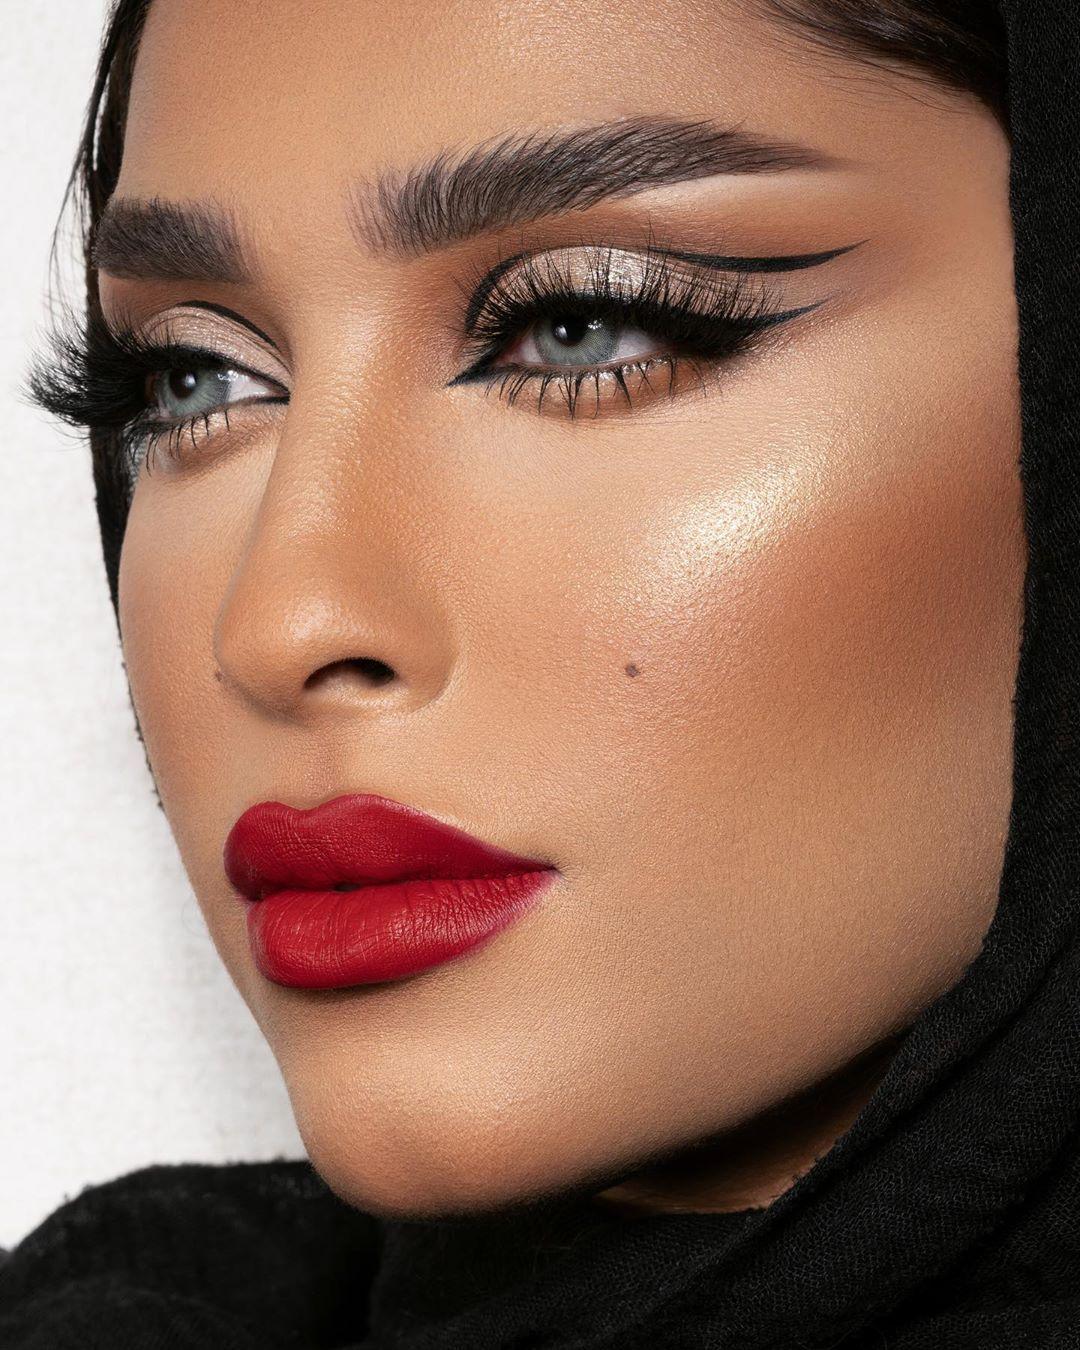 Masooma On Instagram Safa Photographer Photography Expo Touchh Masterclass Jeddah Fentybeauty Killawatt Freestyle Highligh In 2020 Lip Paint Makeup Retouching